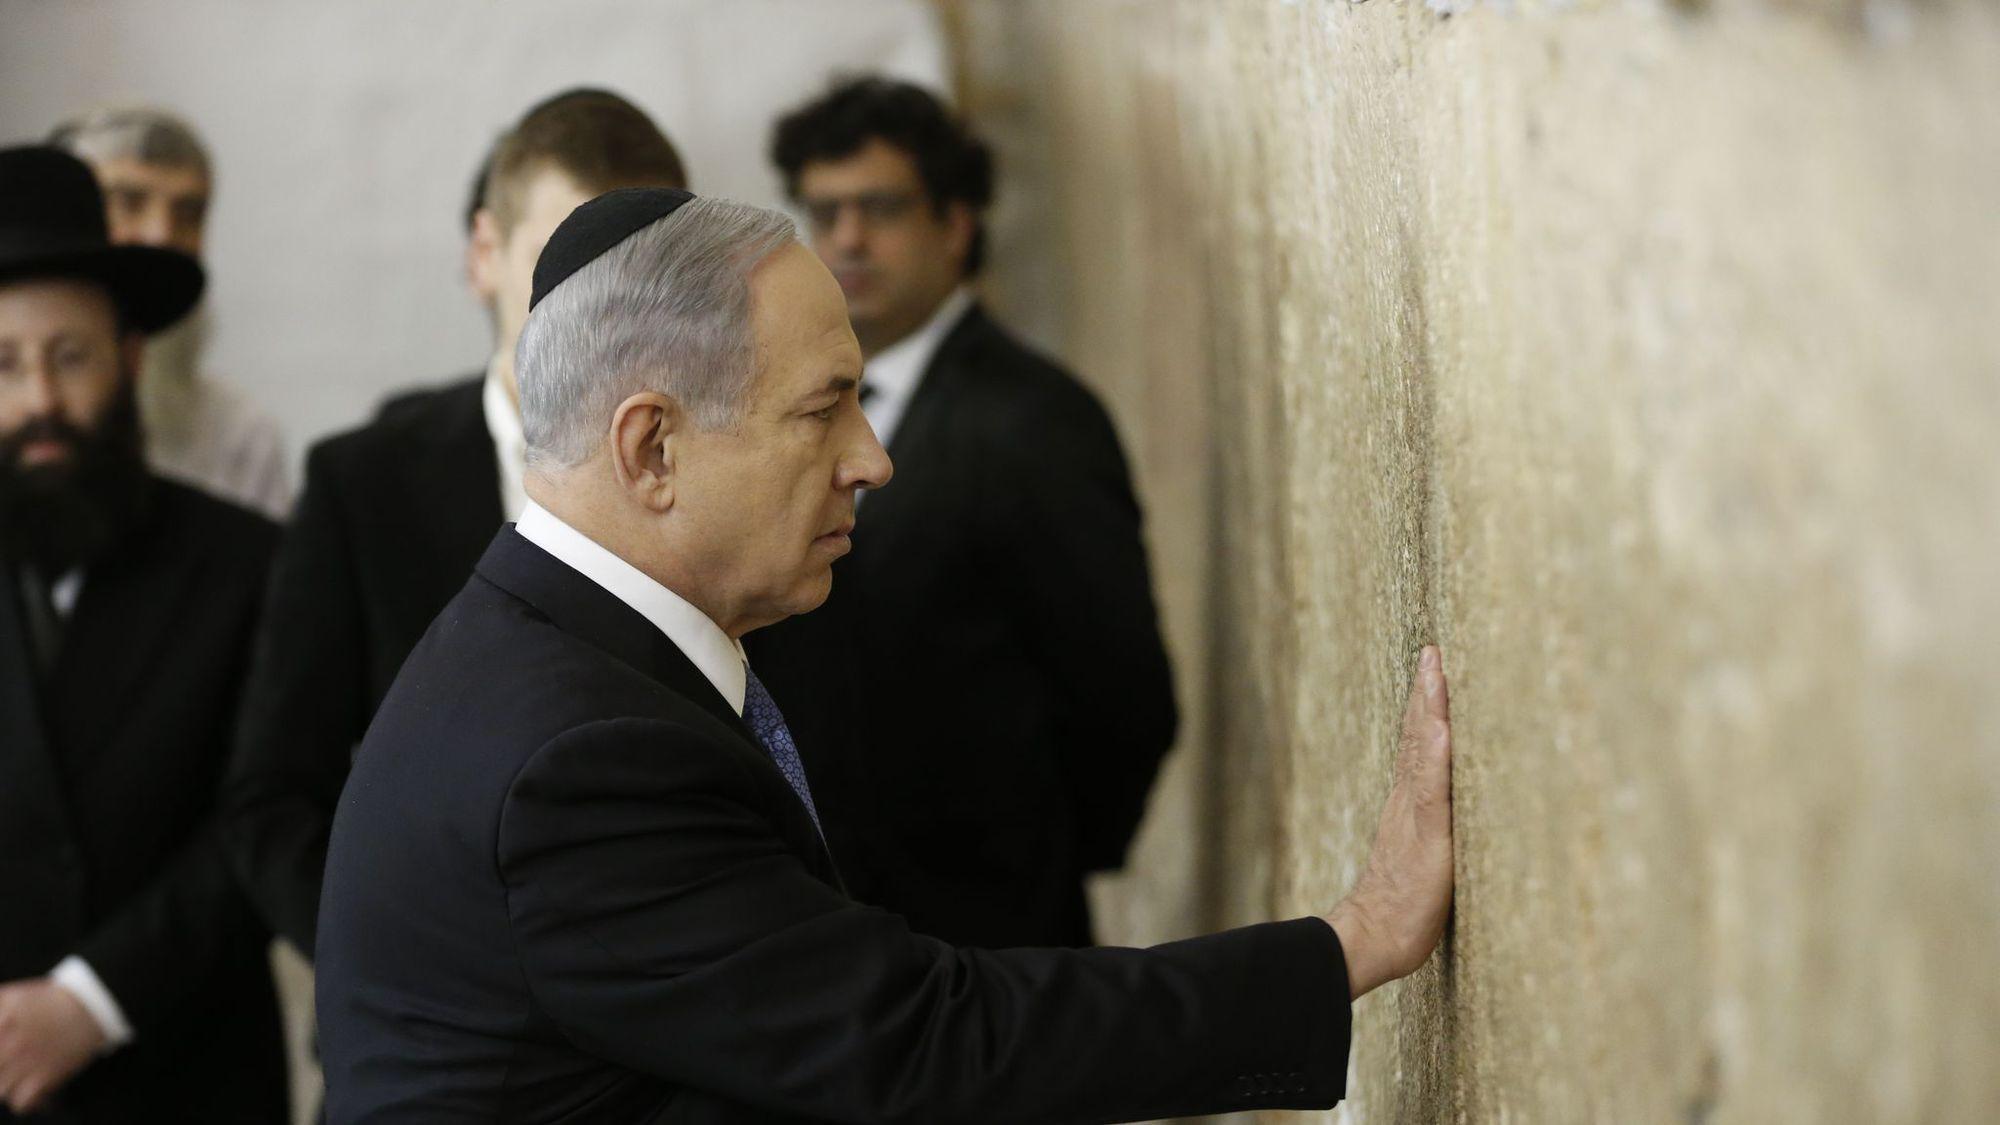 Netanyahu says Western Wall, Temple Mount will always be under Israeli control